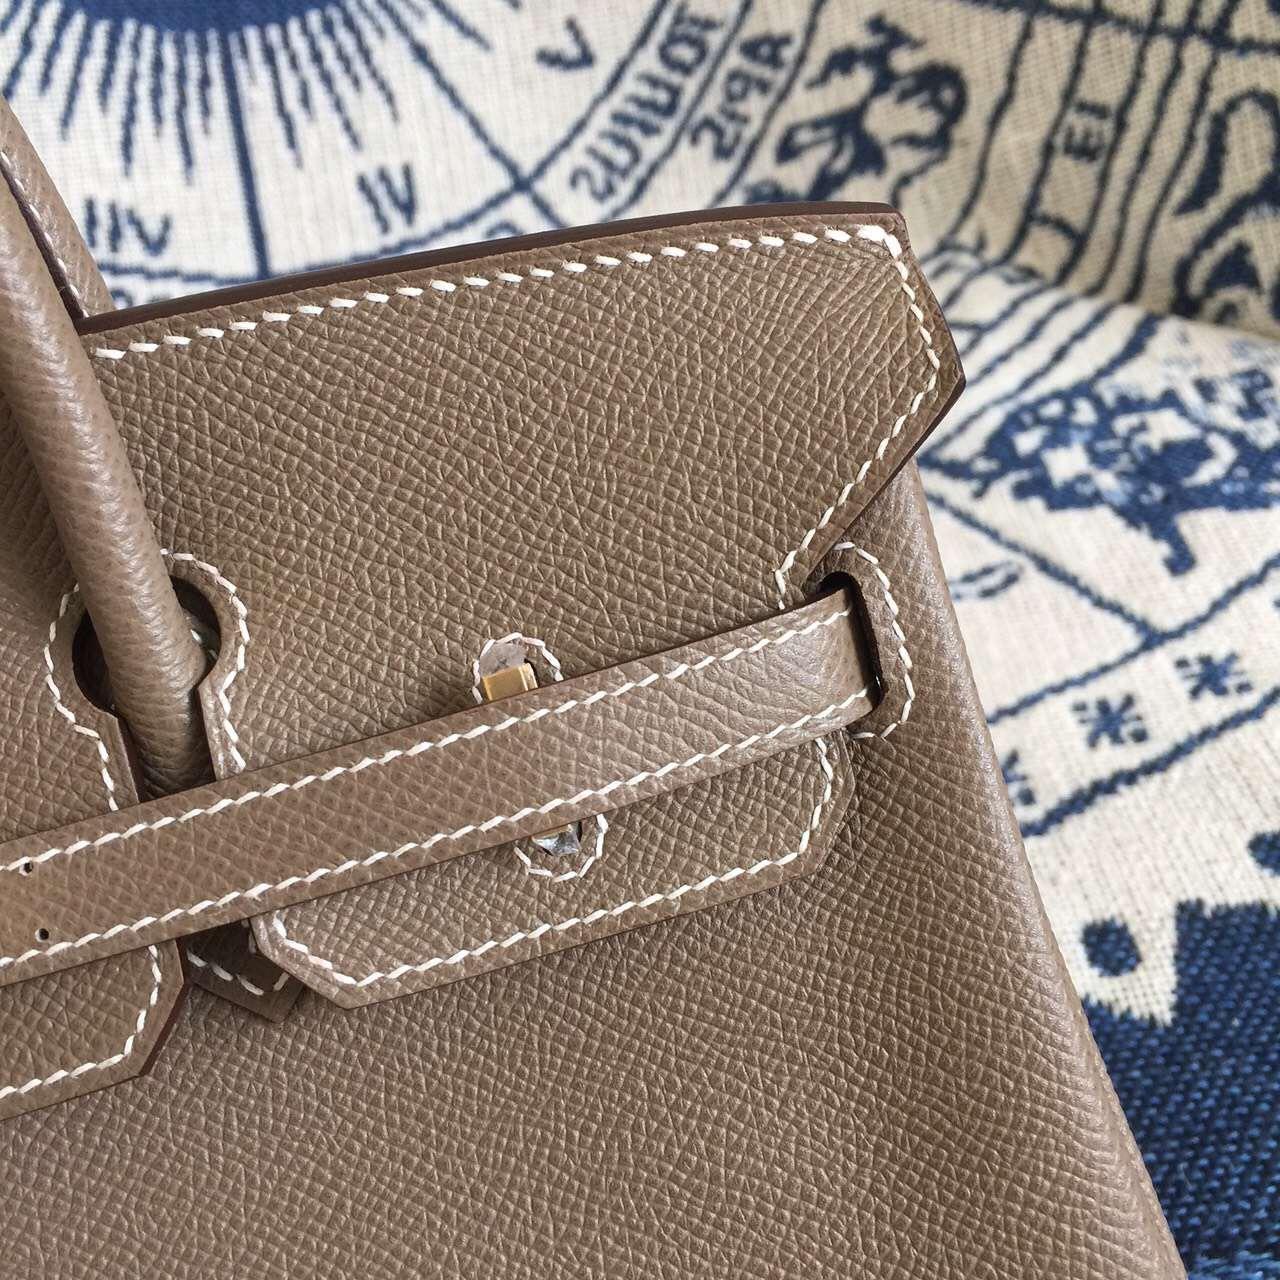 Hand Stitching Hermes C18 Etoupe Grey Epsom Leather Birkin 25CM Ladies' Handbag